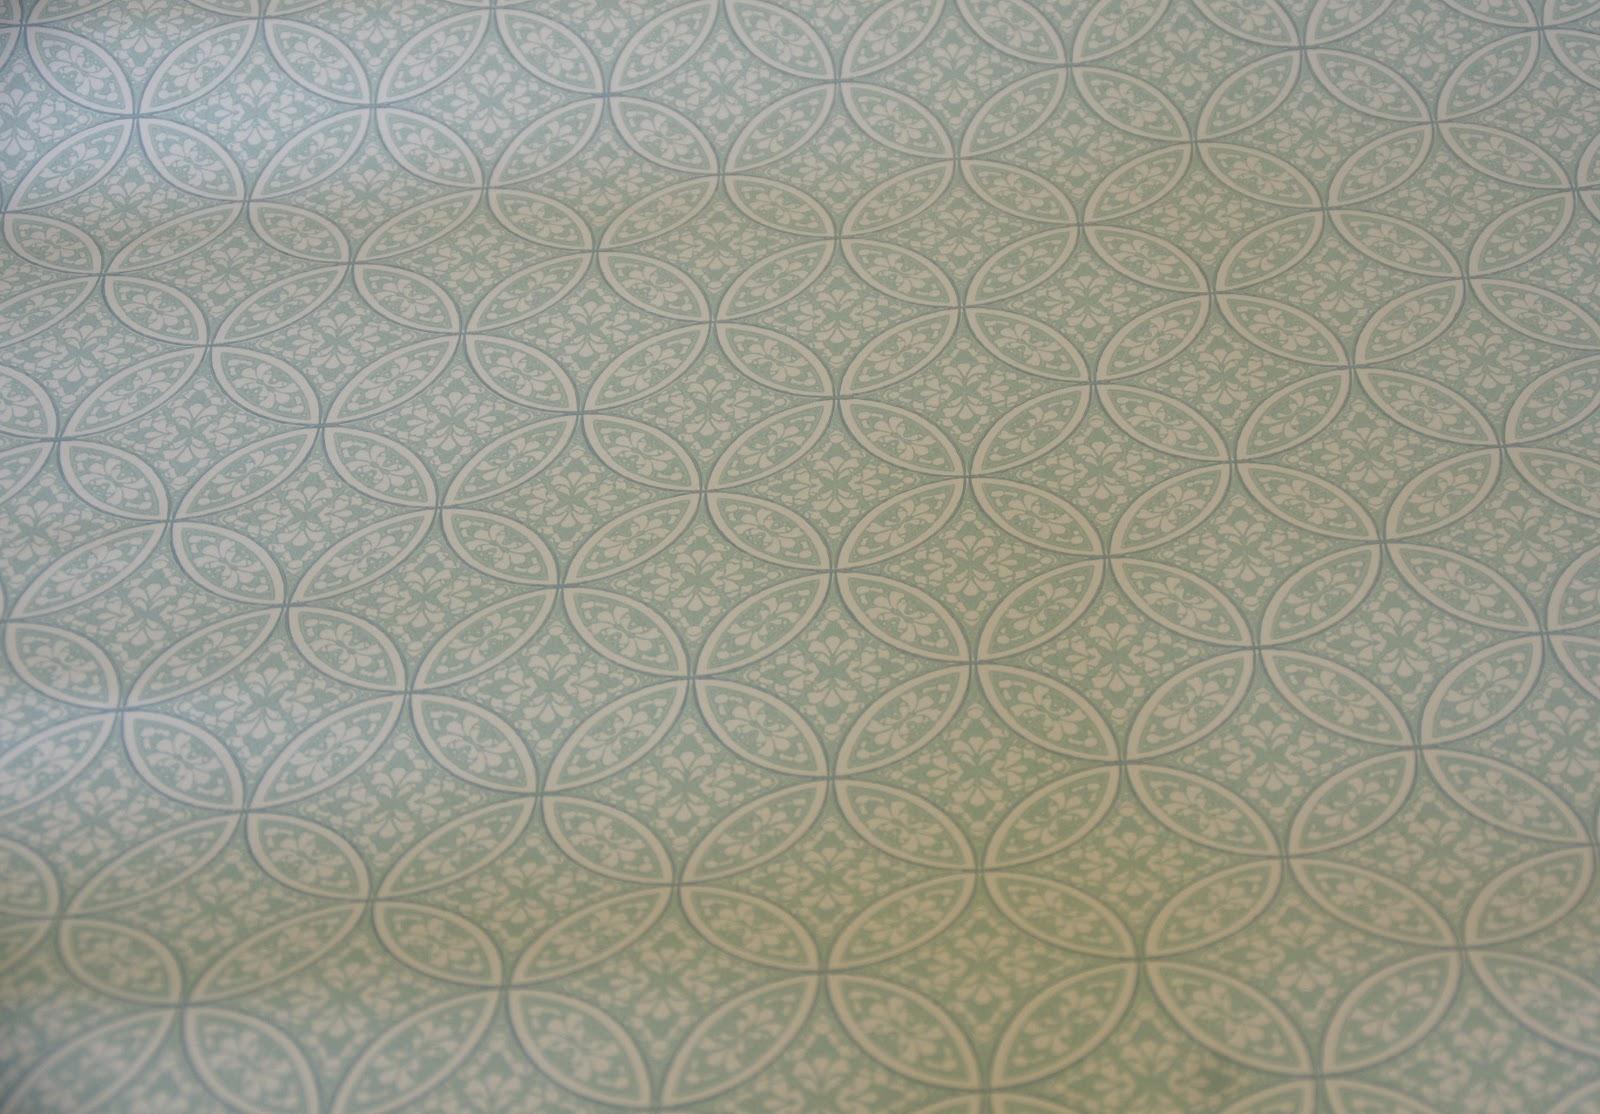 Bathroom wallpaper samples 2017 grasscloth wallpaper for Wallpaper samples